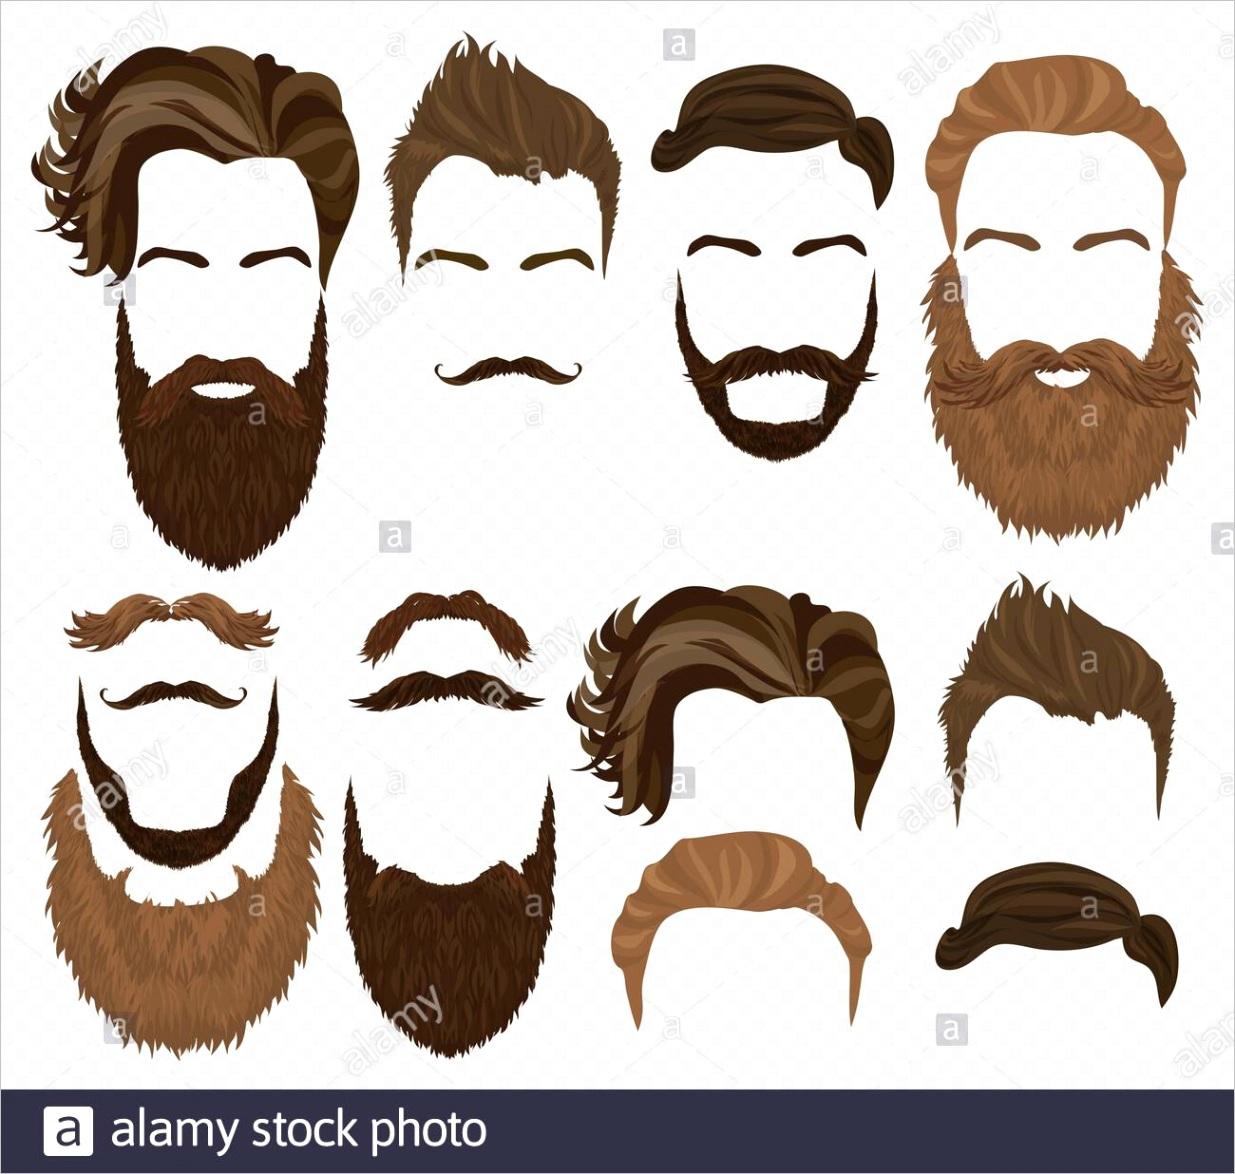 handlebar mustache page=2